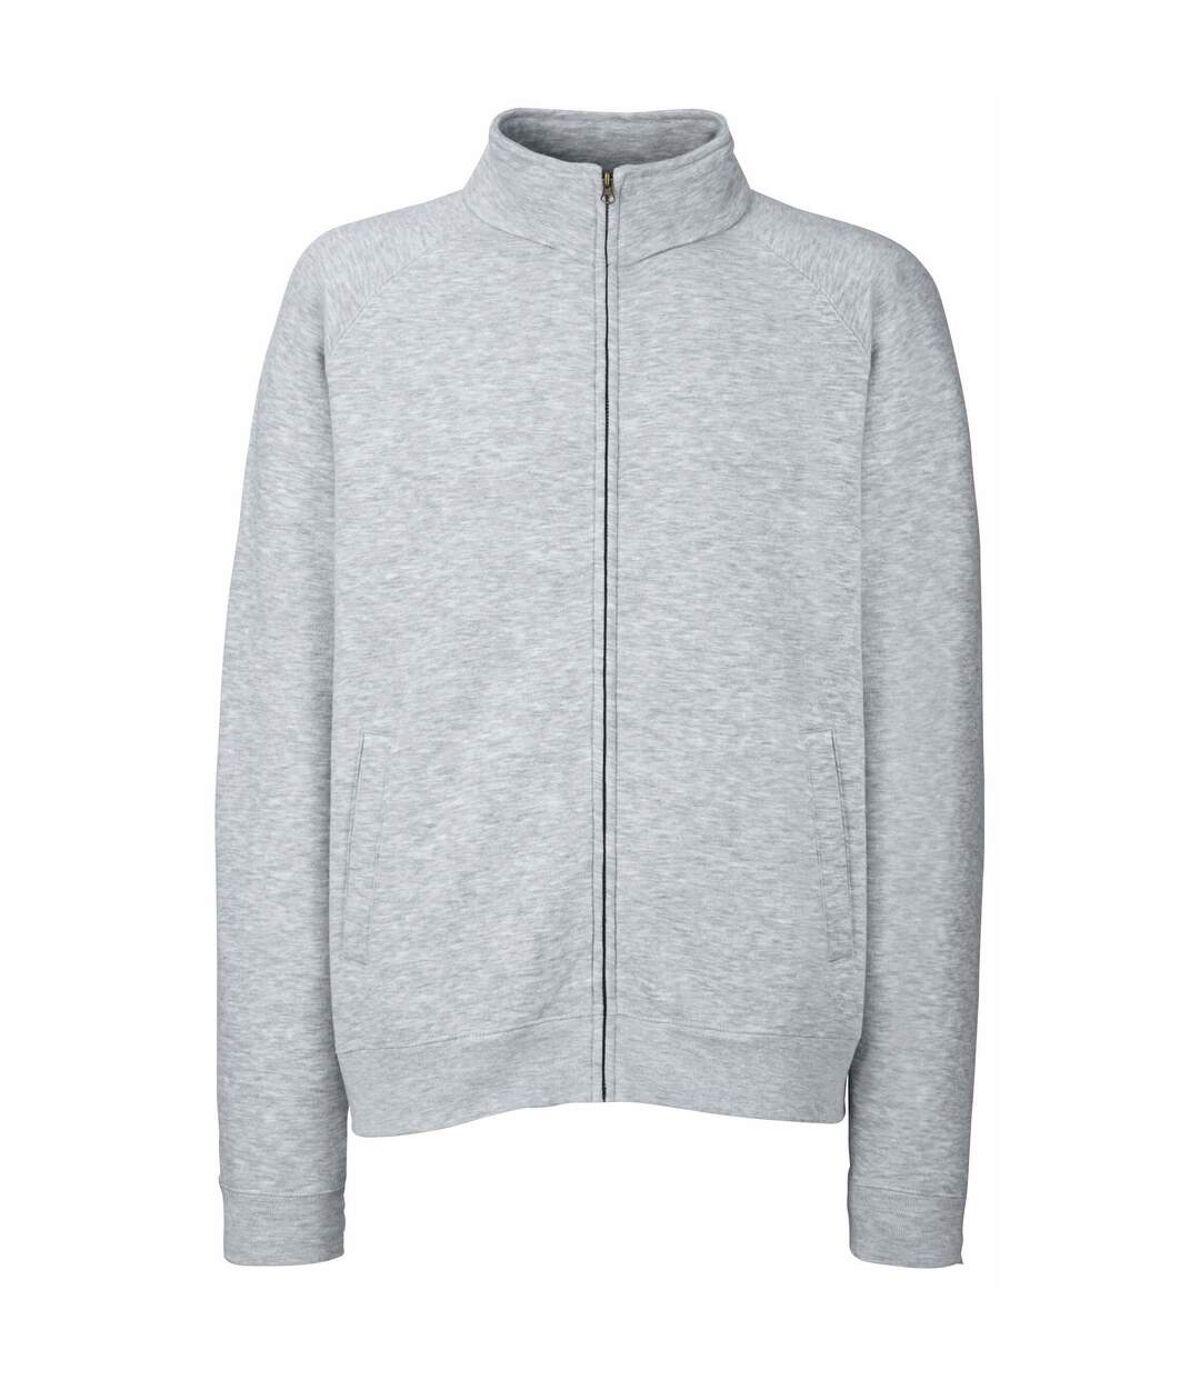 Fruit Of The Loom Mens Sweatshirt Jacket (Black) - UTBC1375